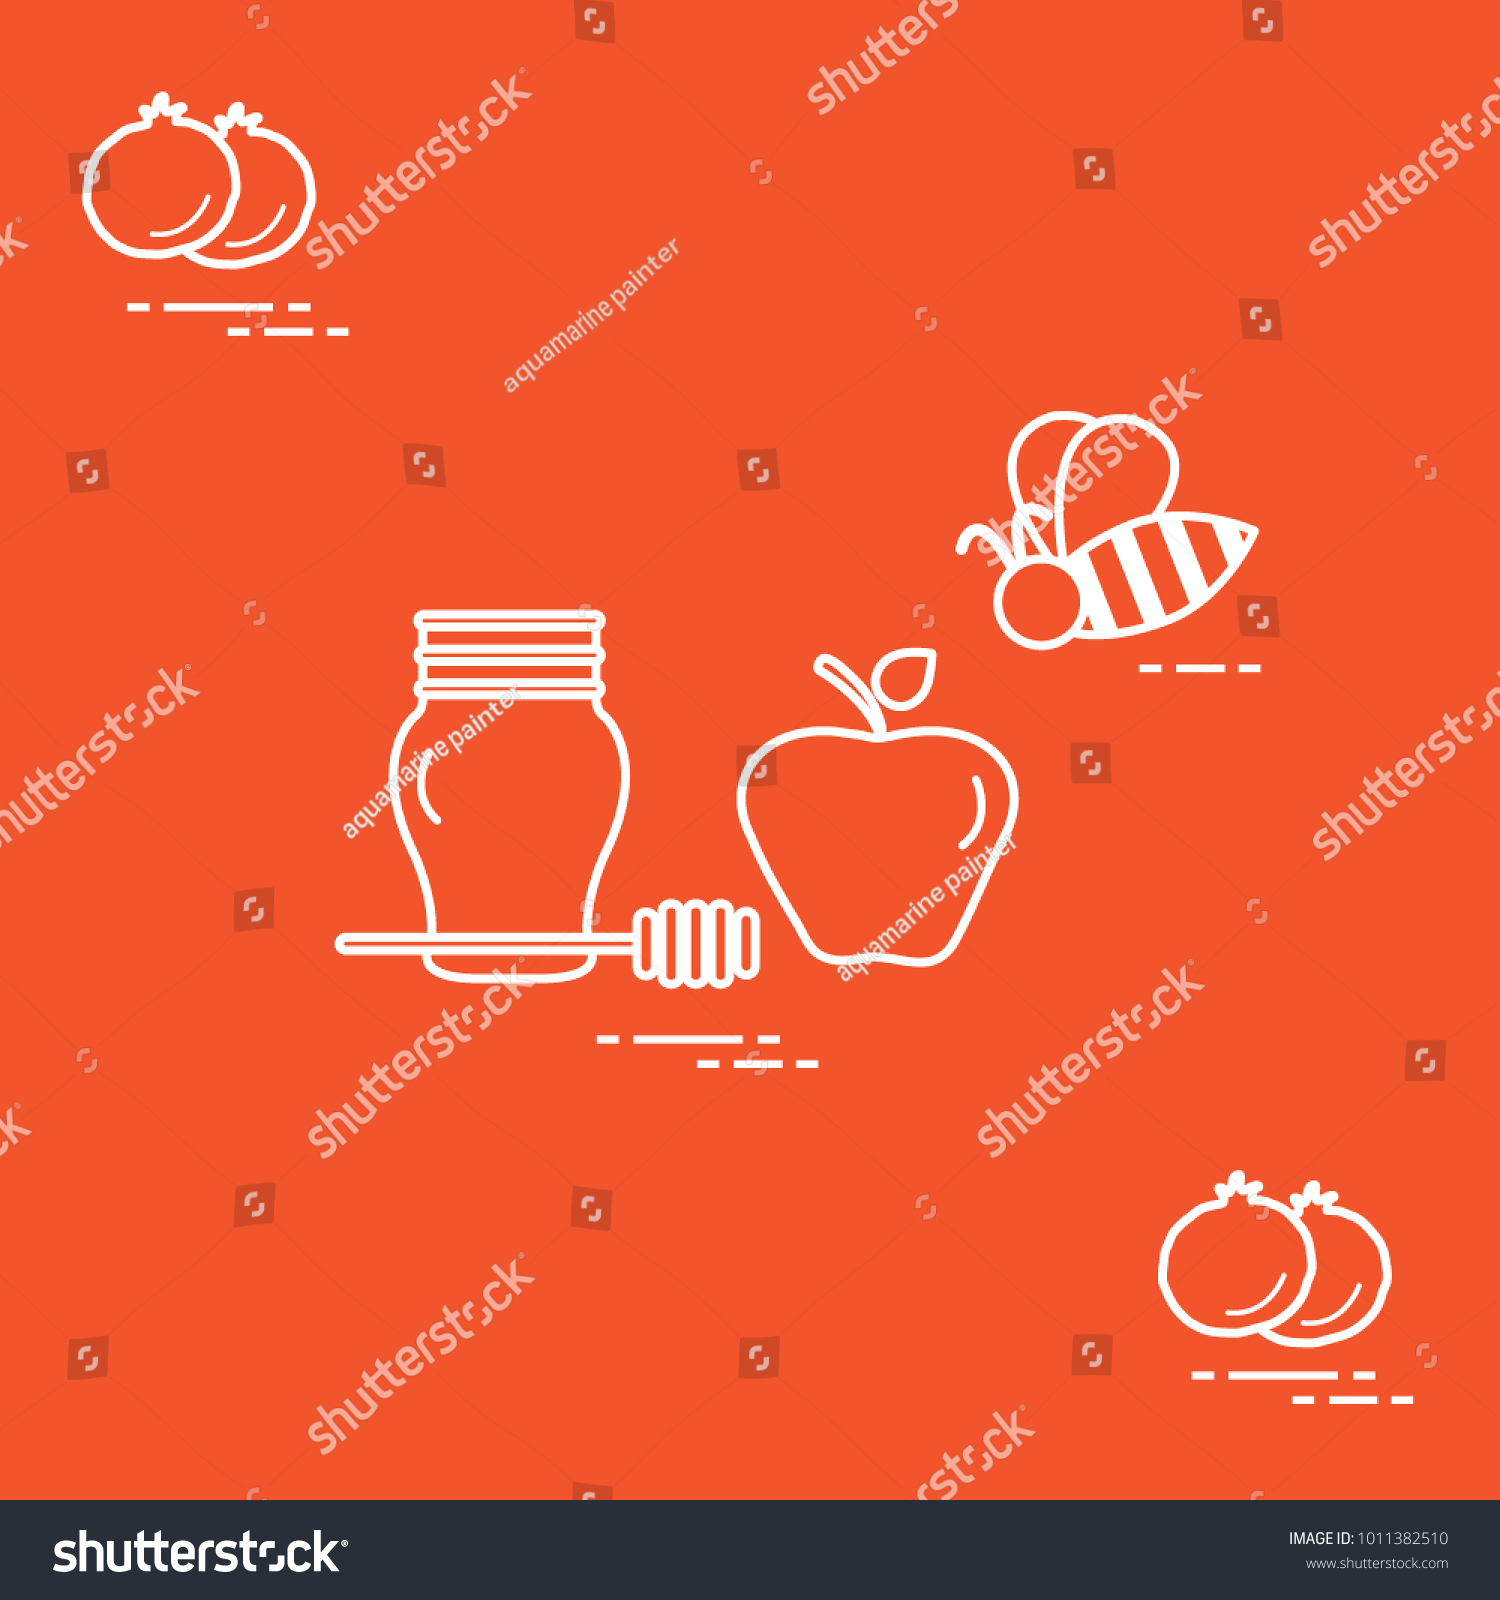 Apple honey rosh hashanah pomegranate bee stock vector 1011382510 apple in honey in rosh hashanah pomegranate bee traditional jewish food and symbols biocorpaavc